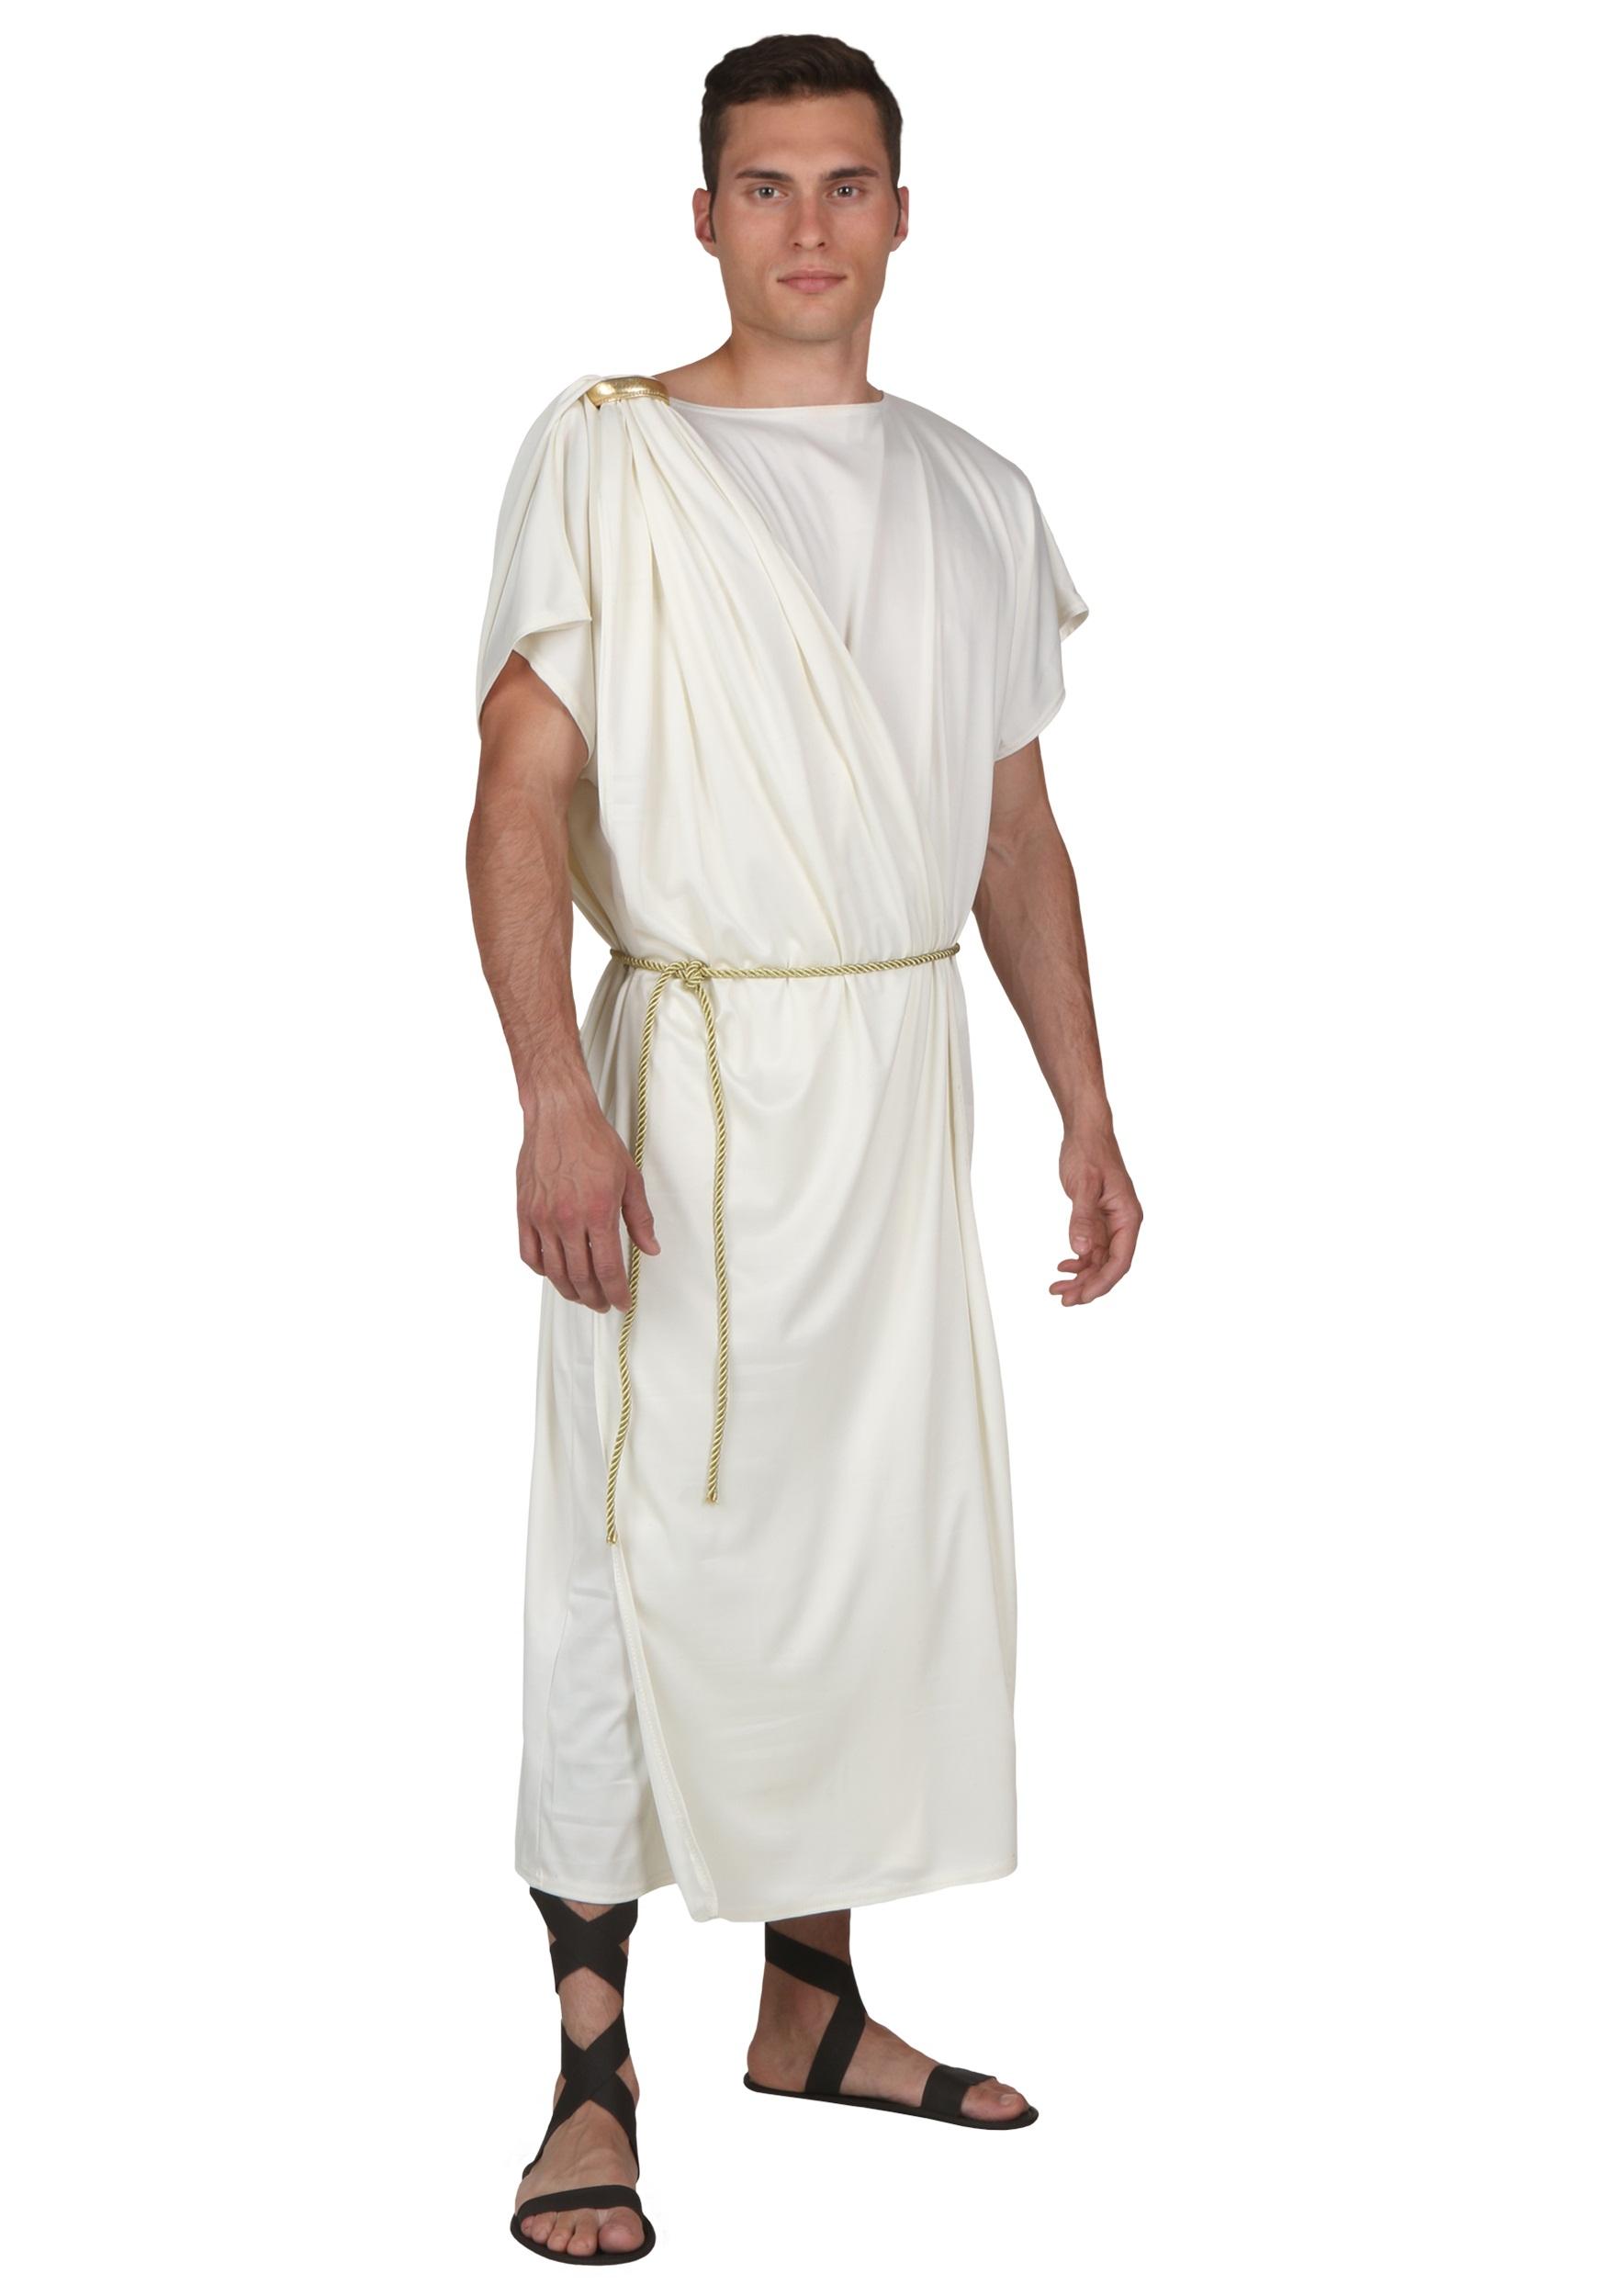 Plus Size Toga Halloween Costume for Men | Greek Costume